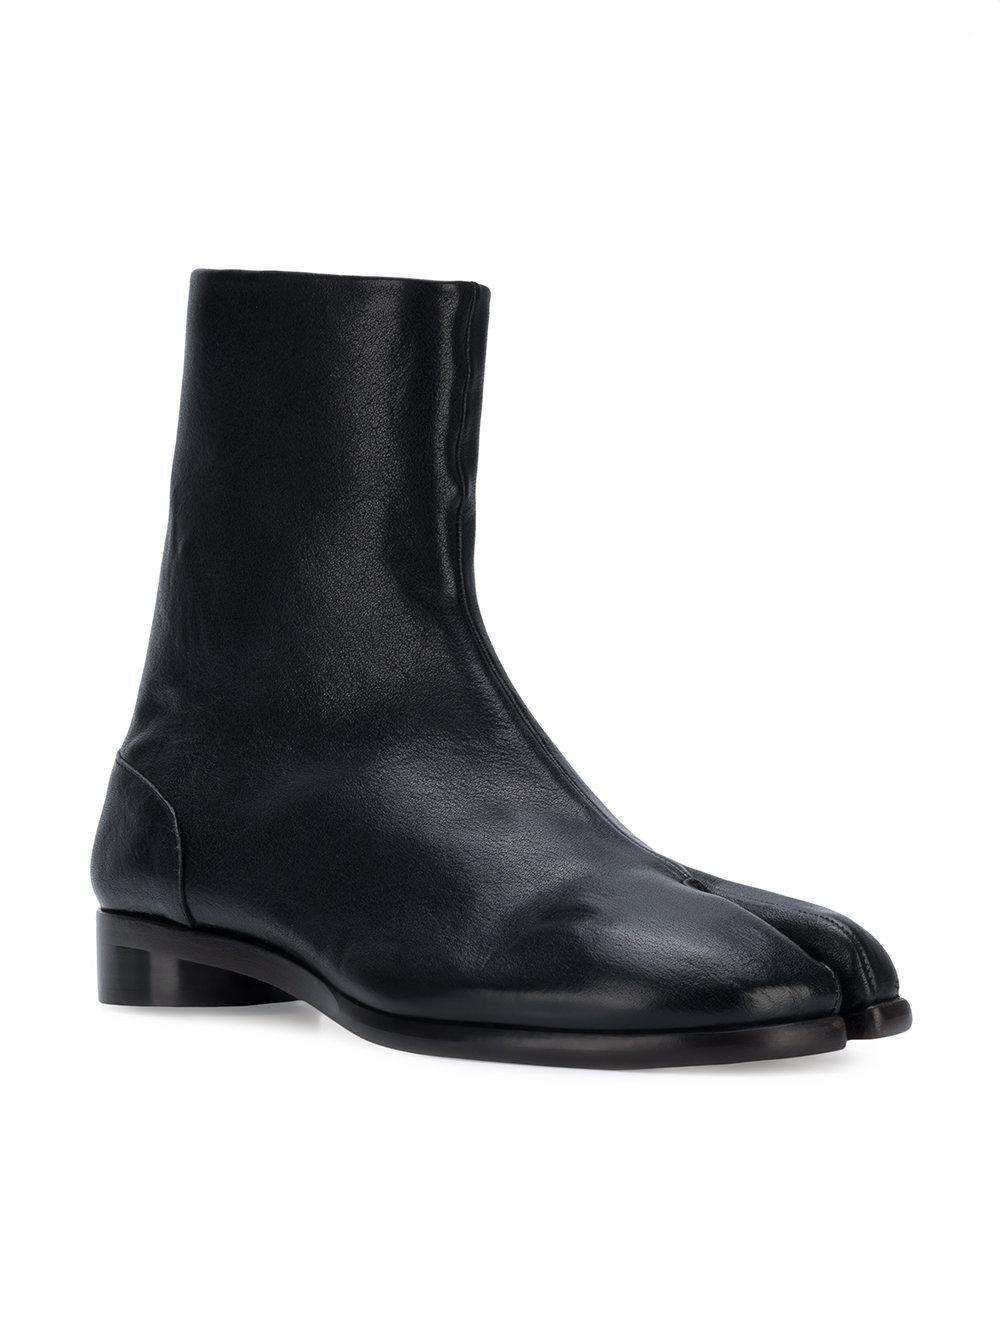 Maison Margiela Leather Brogue Ankle Boots buy cheap explore CGZbNy0Xg